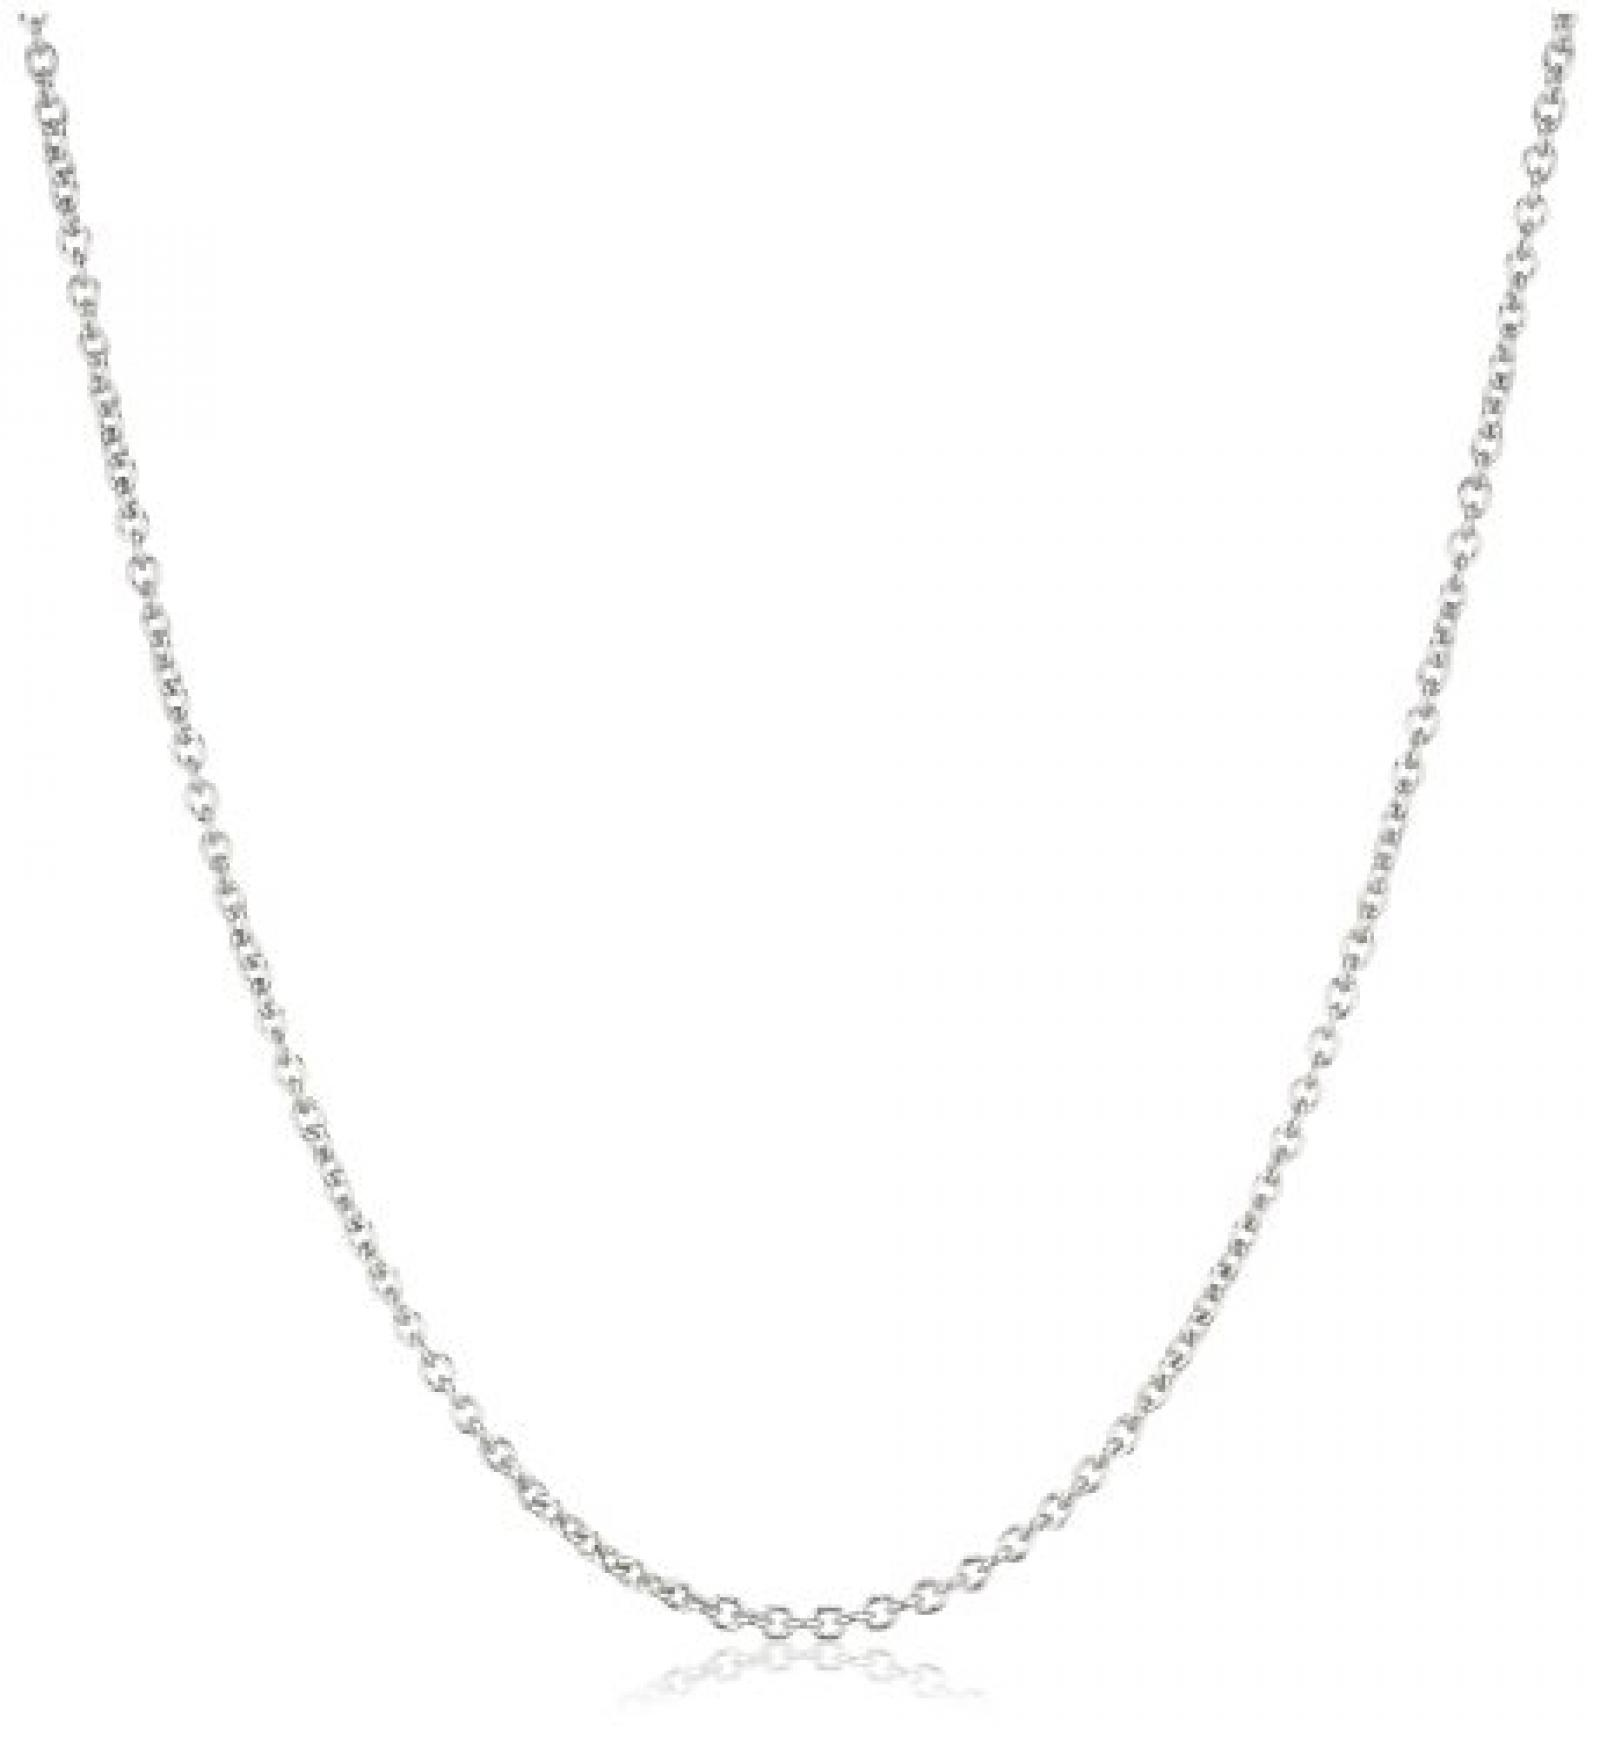 Dyrberg/Kern Damen-Halskette Priam 40 Shiny Silber 332371